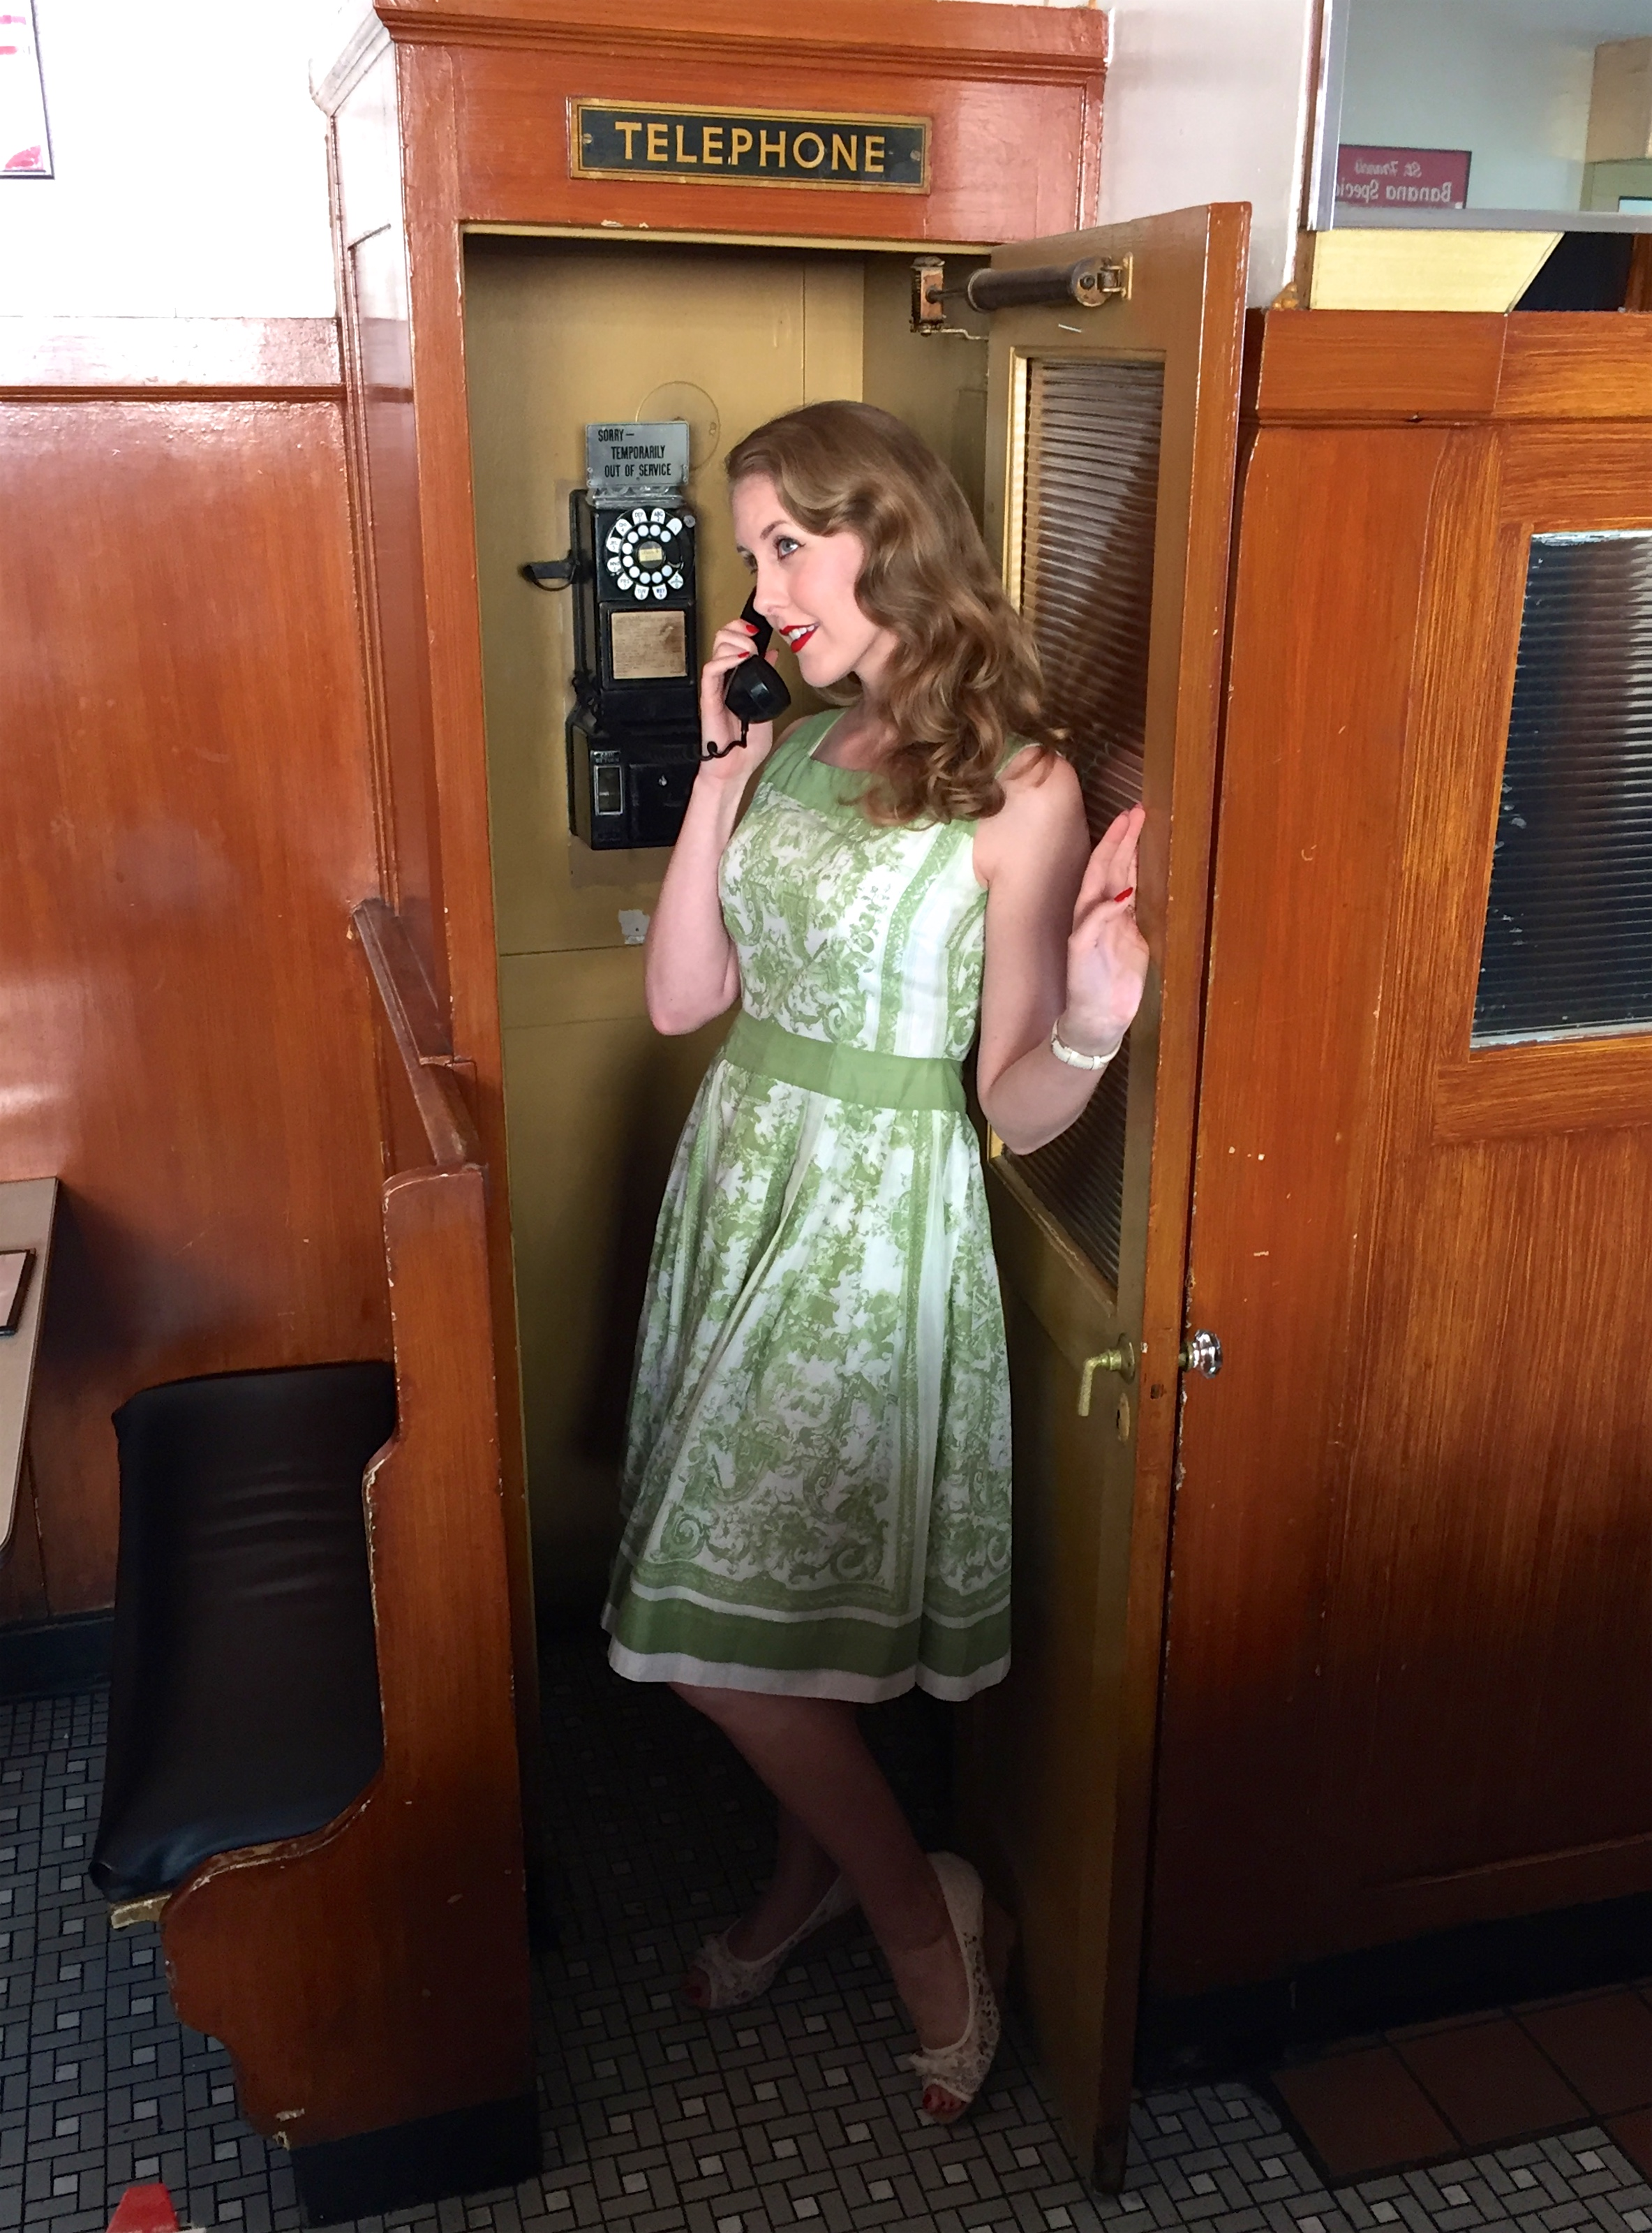 Katrina having fun with the phone booth